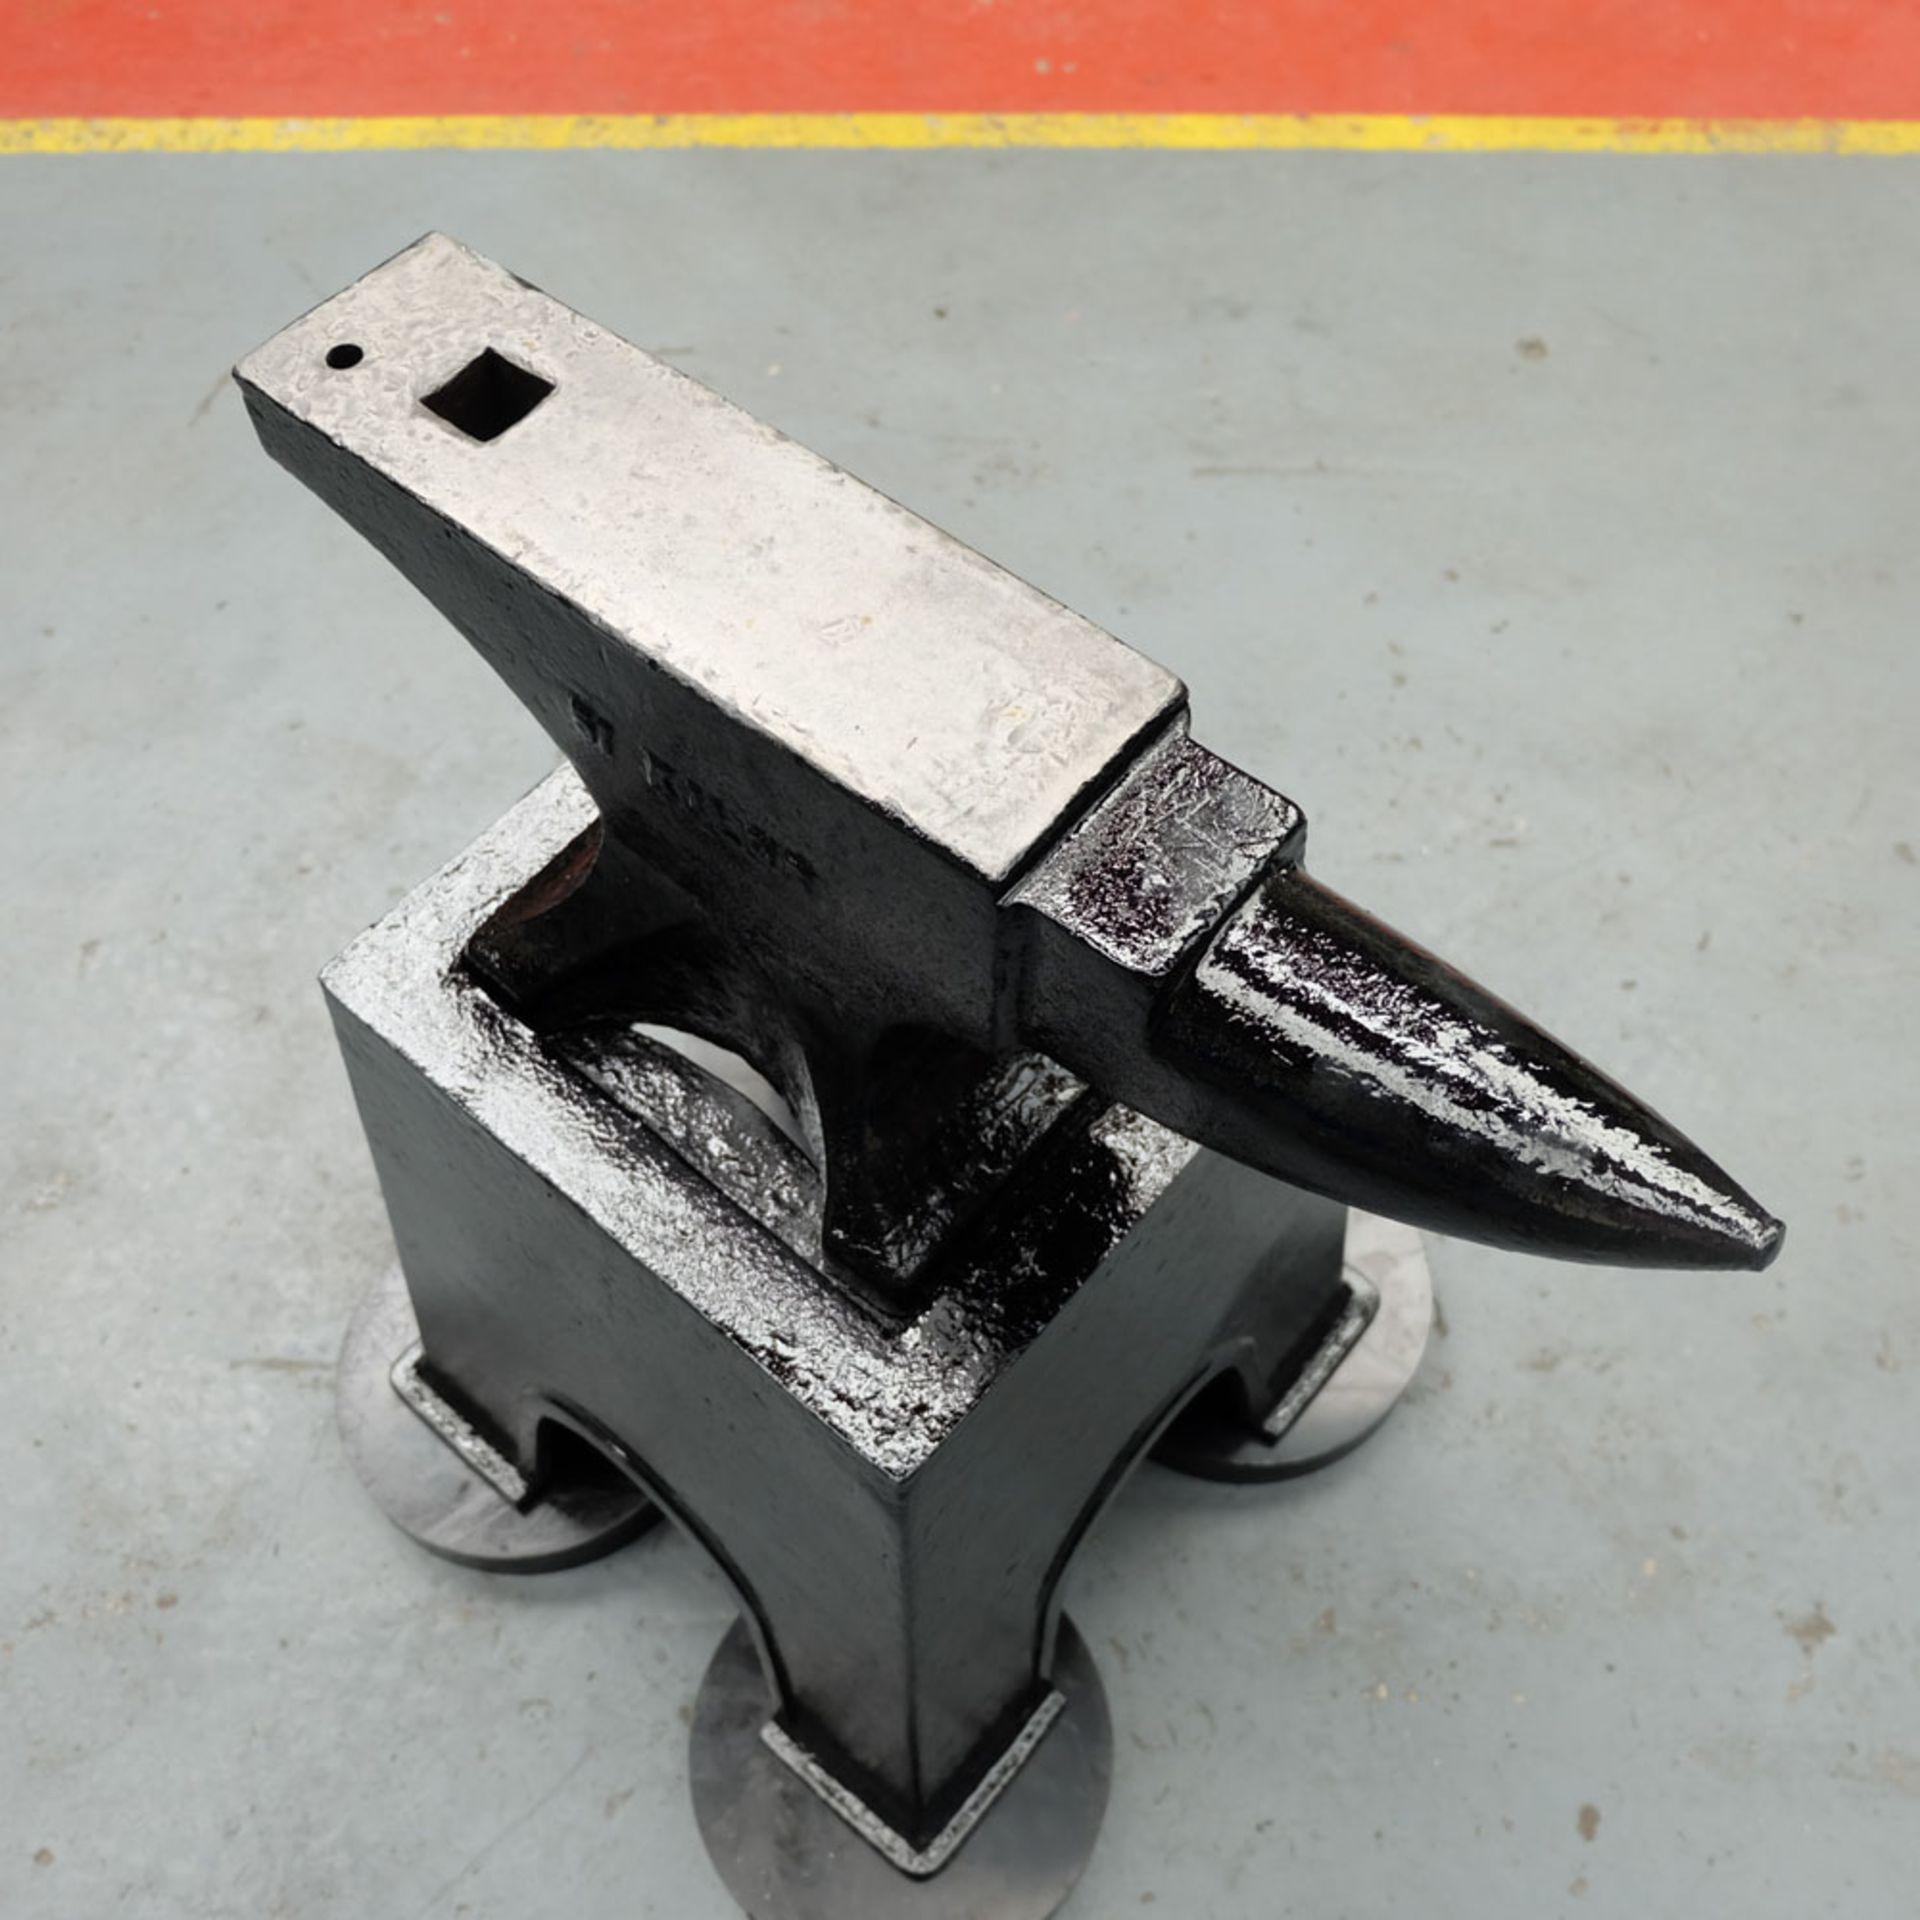 Lot 75 - A Blacksmiths Anvil on Stand, 1 cwt-51Kilos.